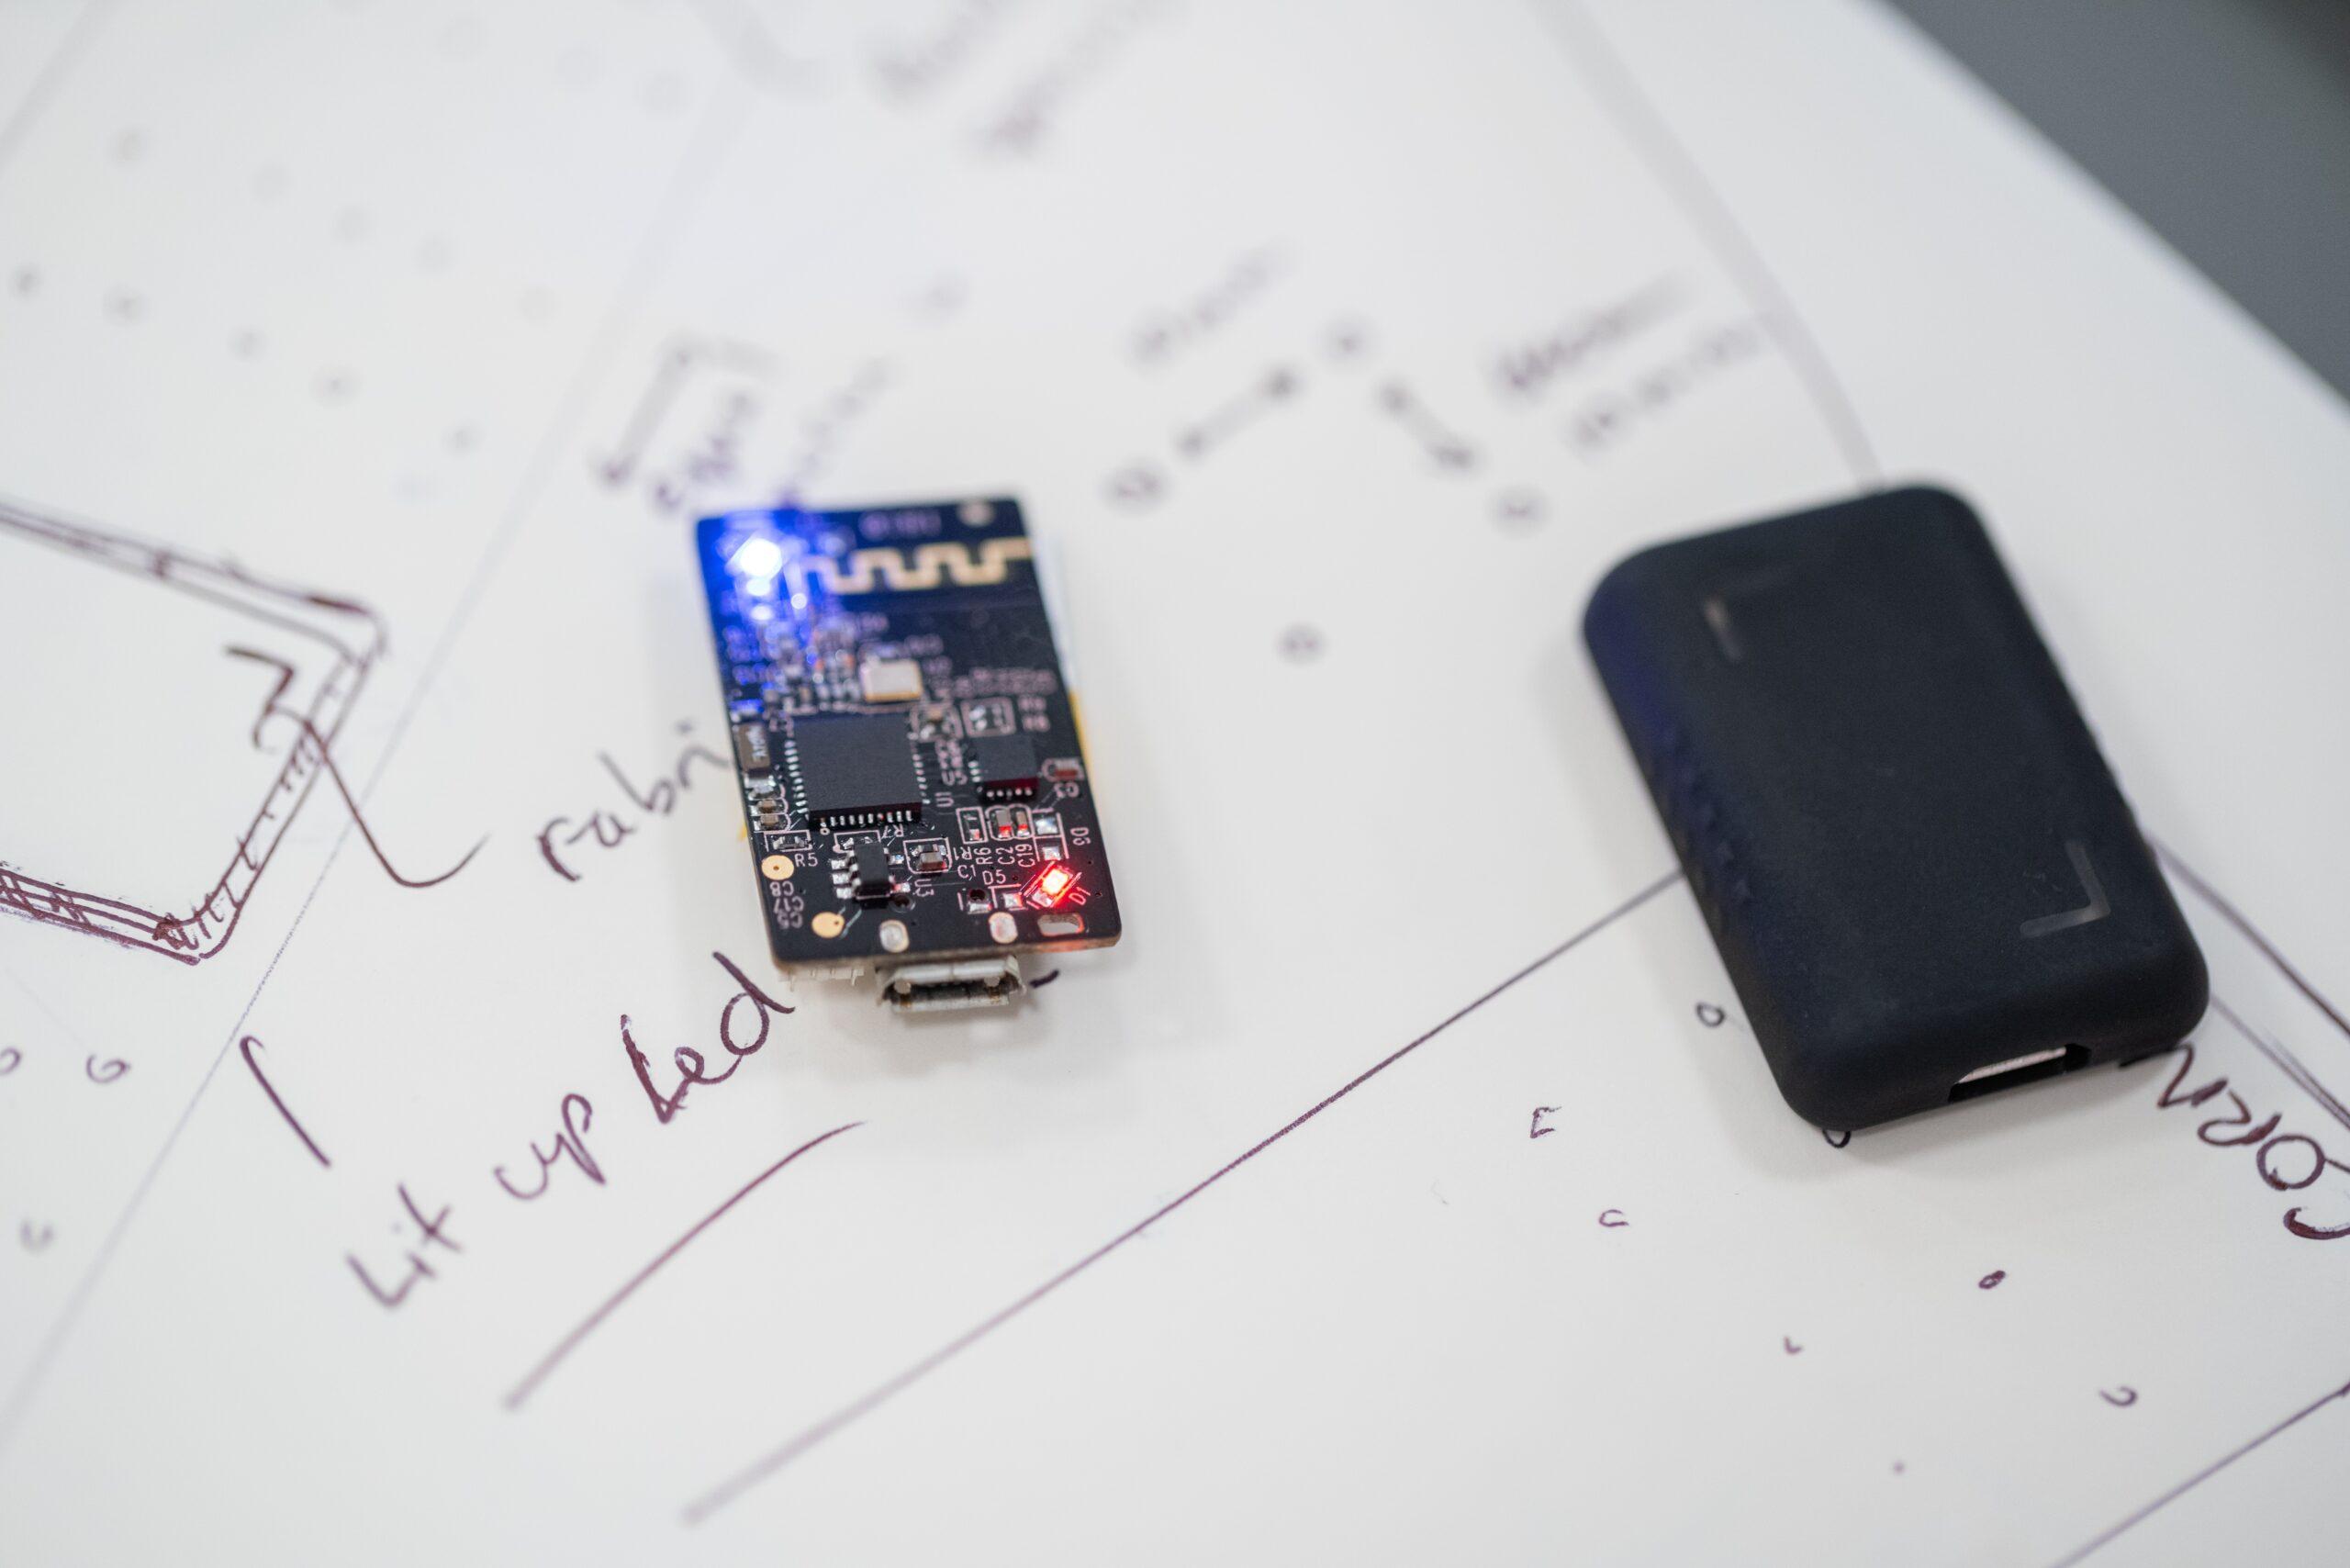 Nowoczesne technologie a klienci